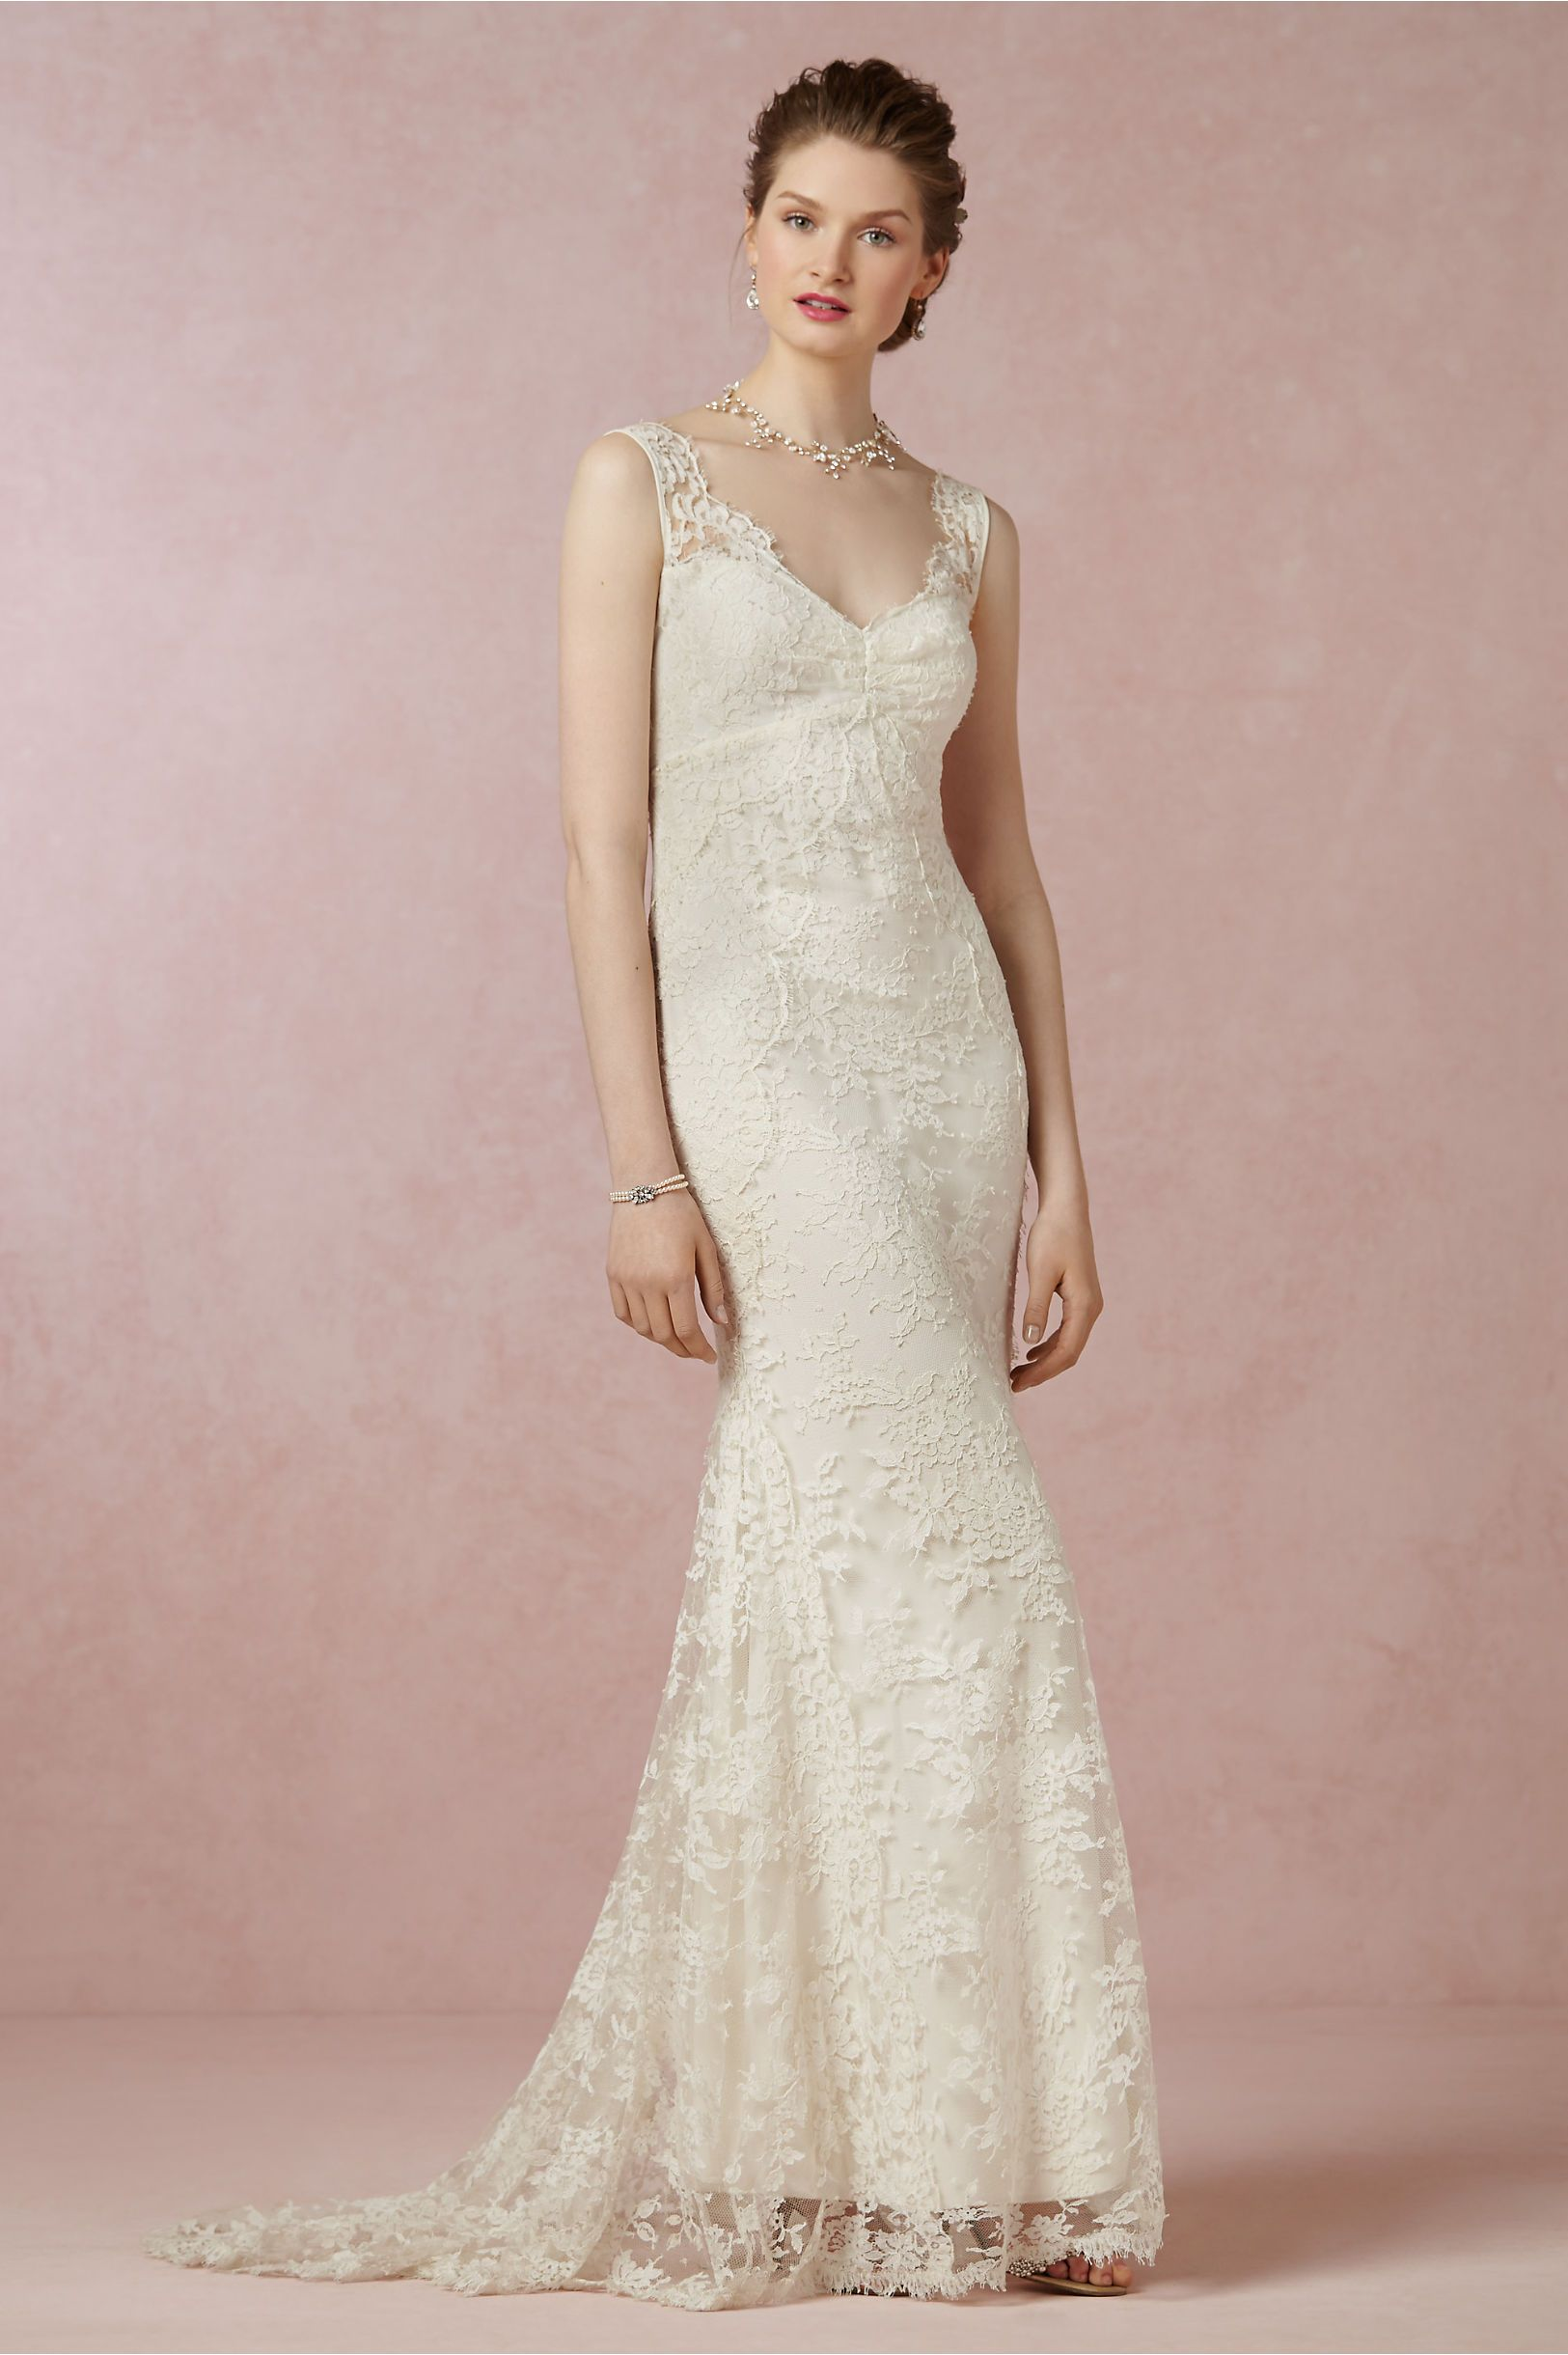 Marie Gown Wedding Dresses Bridal Dress Design Lace Mermaid